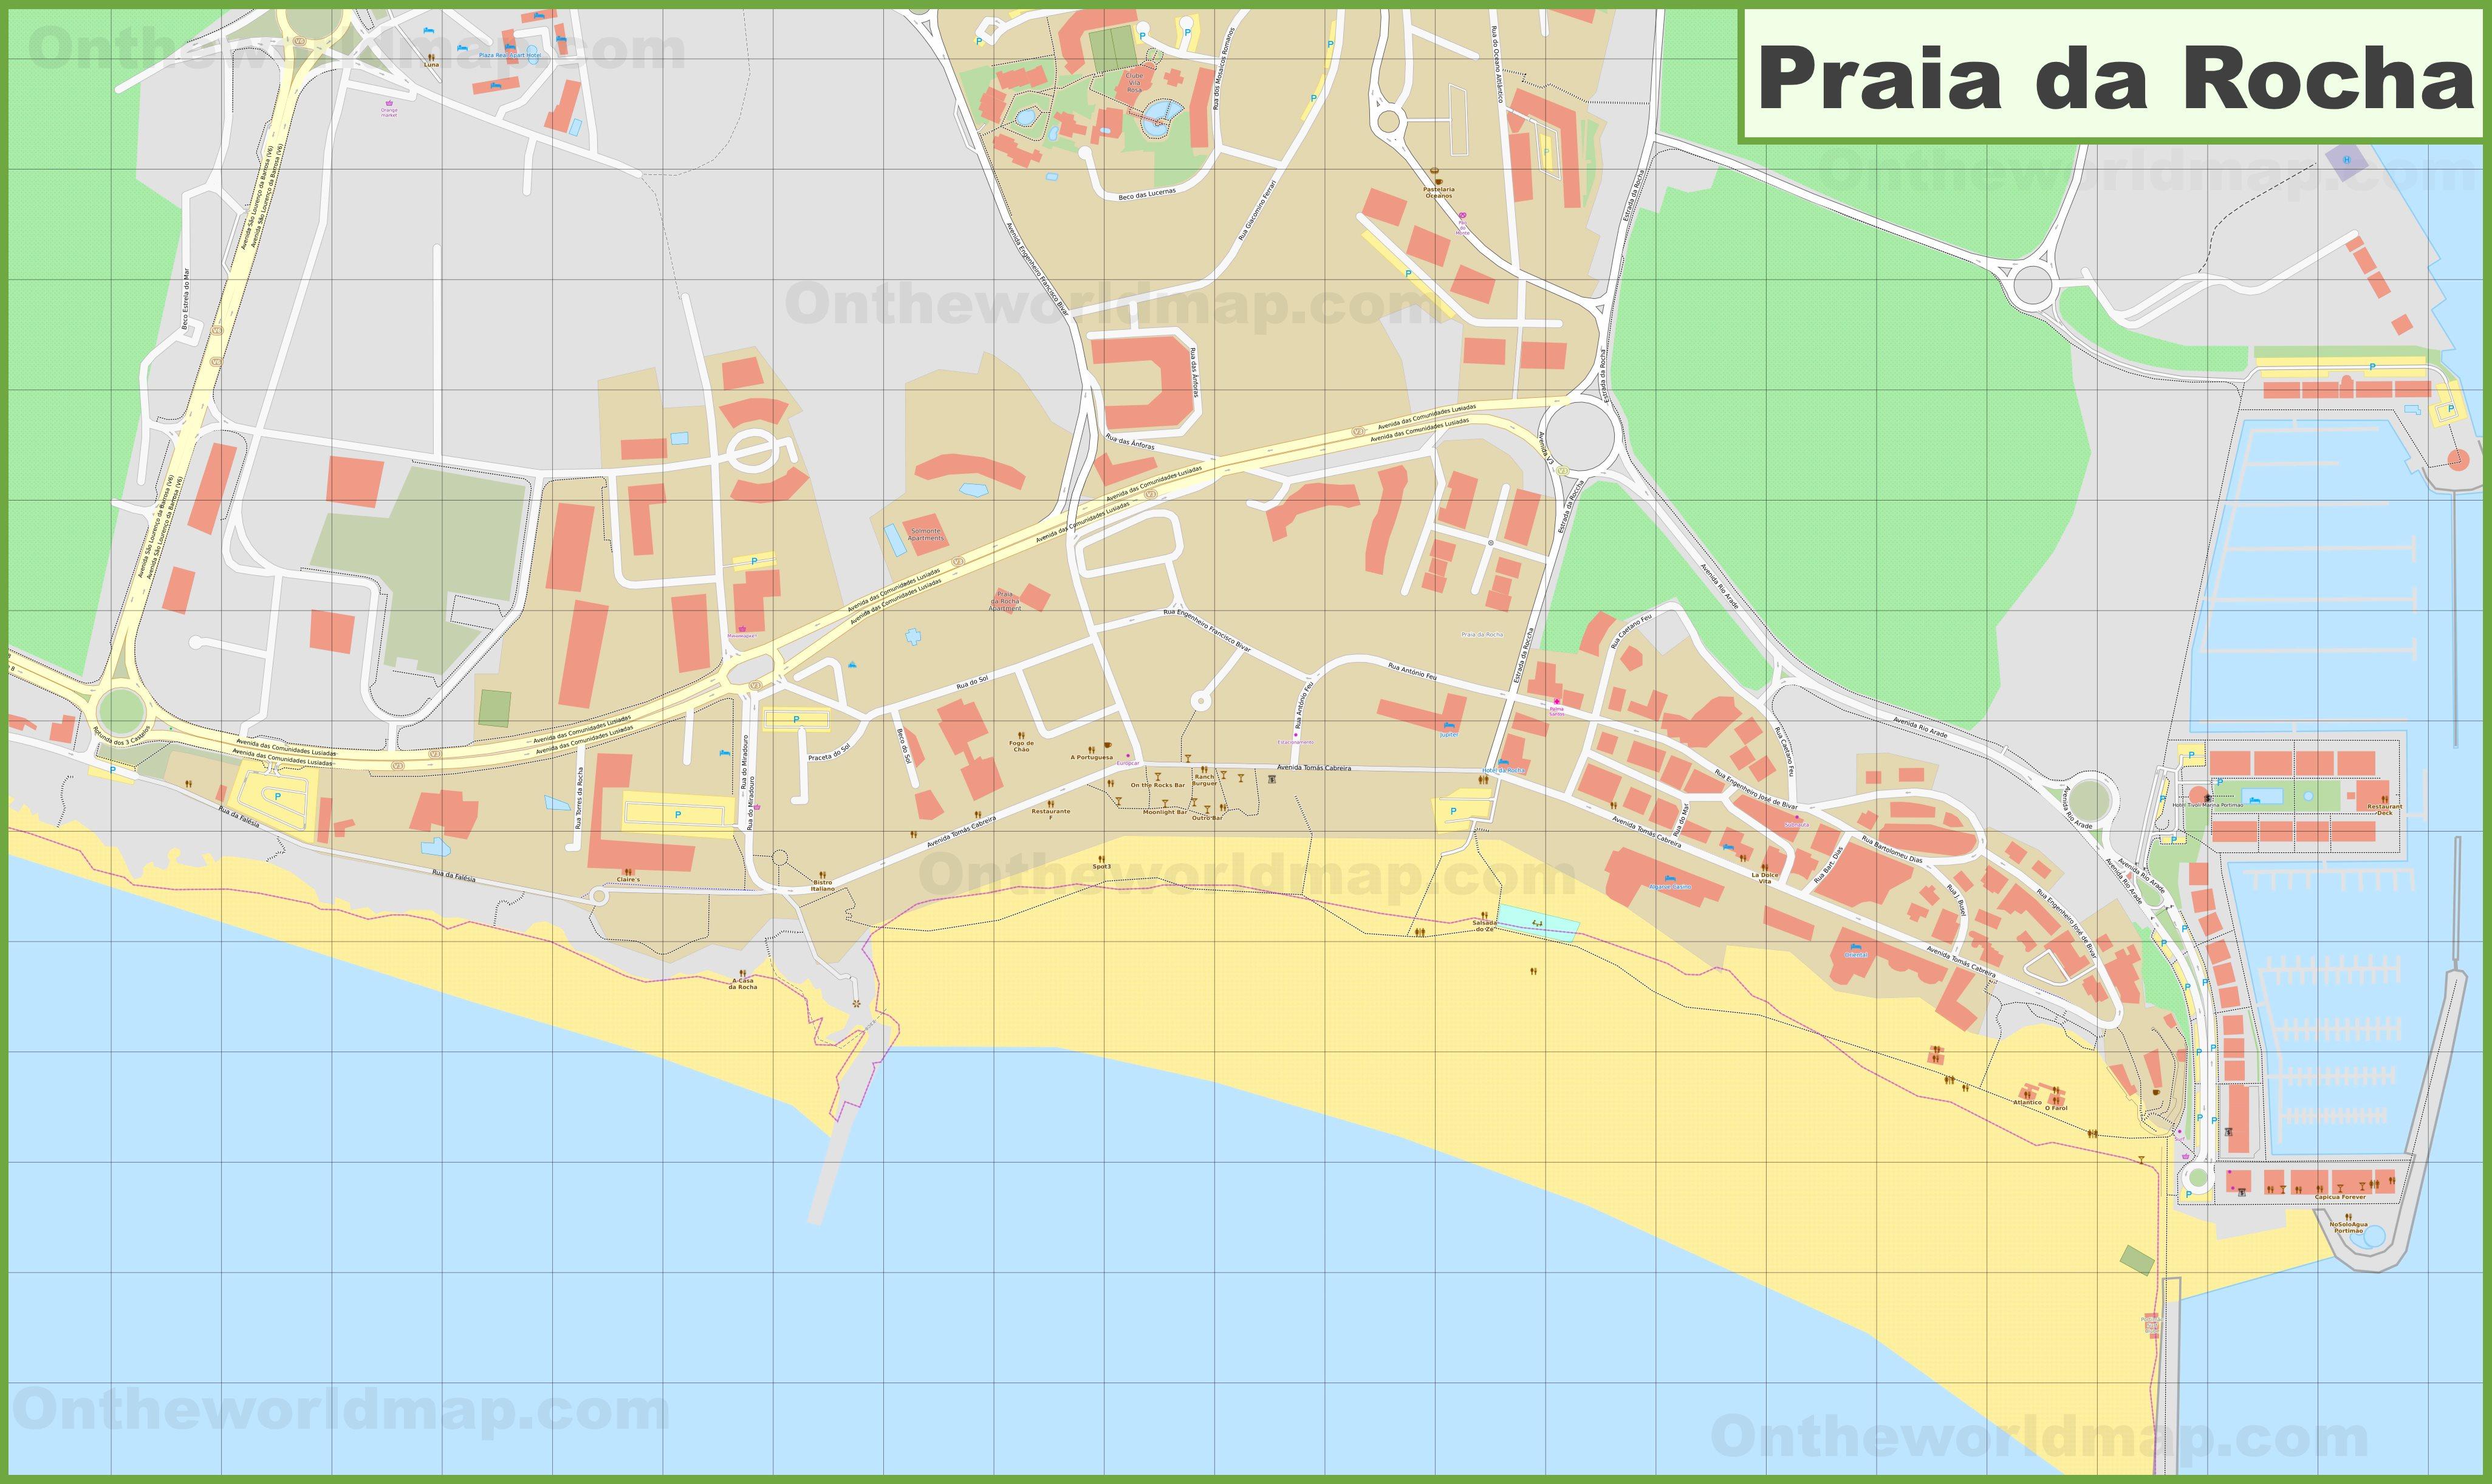 Praia Da Rocha Map Detailed map of Praia da Rocha